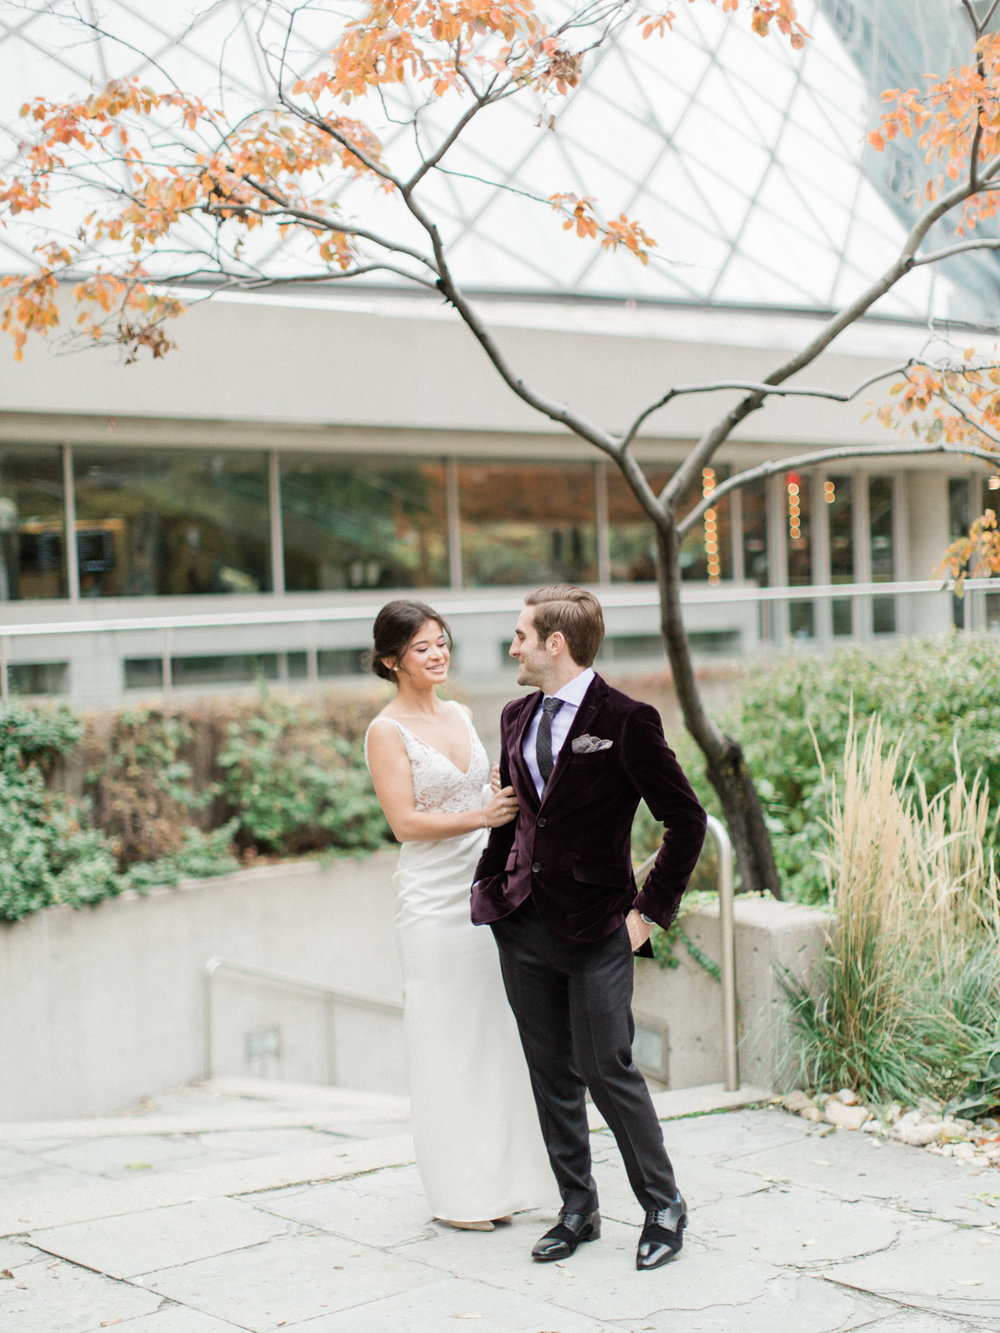 corynn-fowler-photography-toronto-collingwood-destination-wedding-photographer-127.jpg